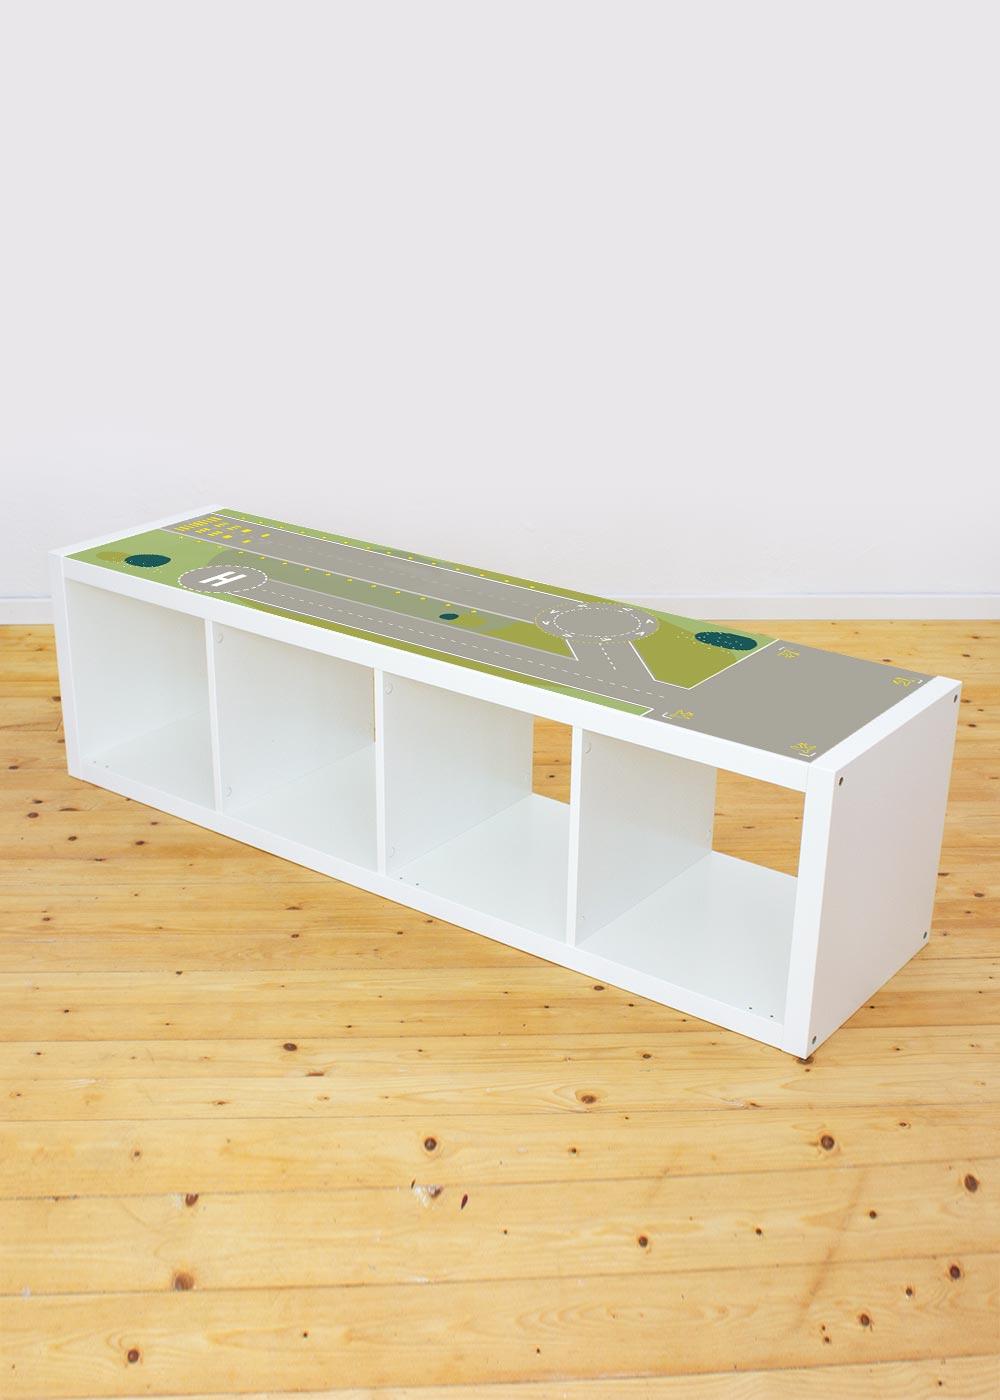 Ikea Kallax Regal Landebahn 4fach Komplettansicht